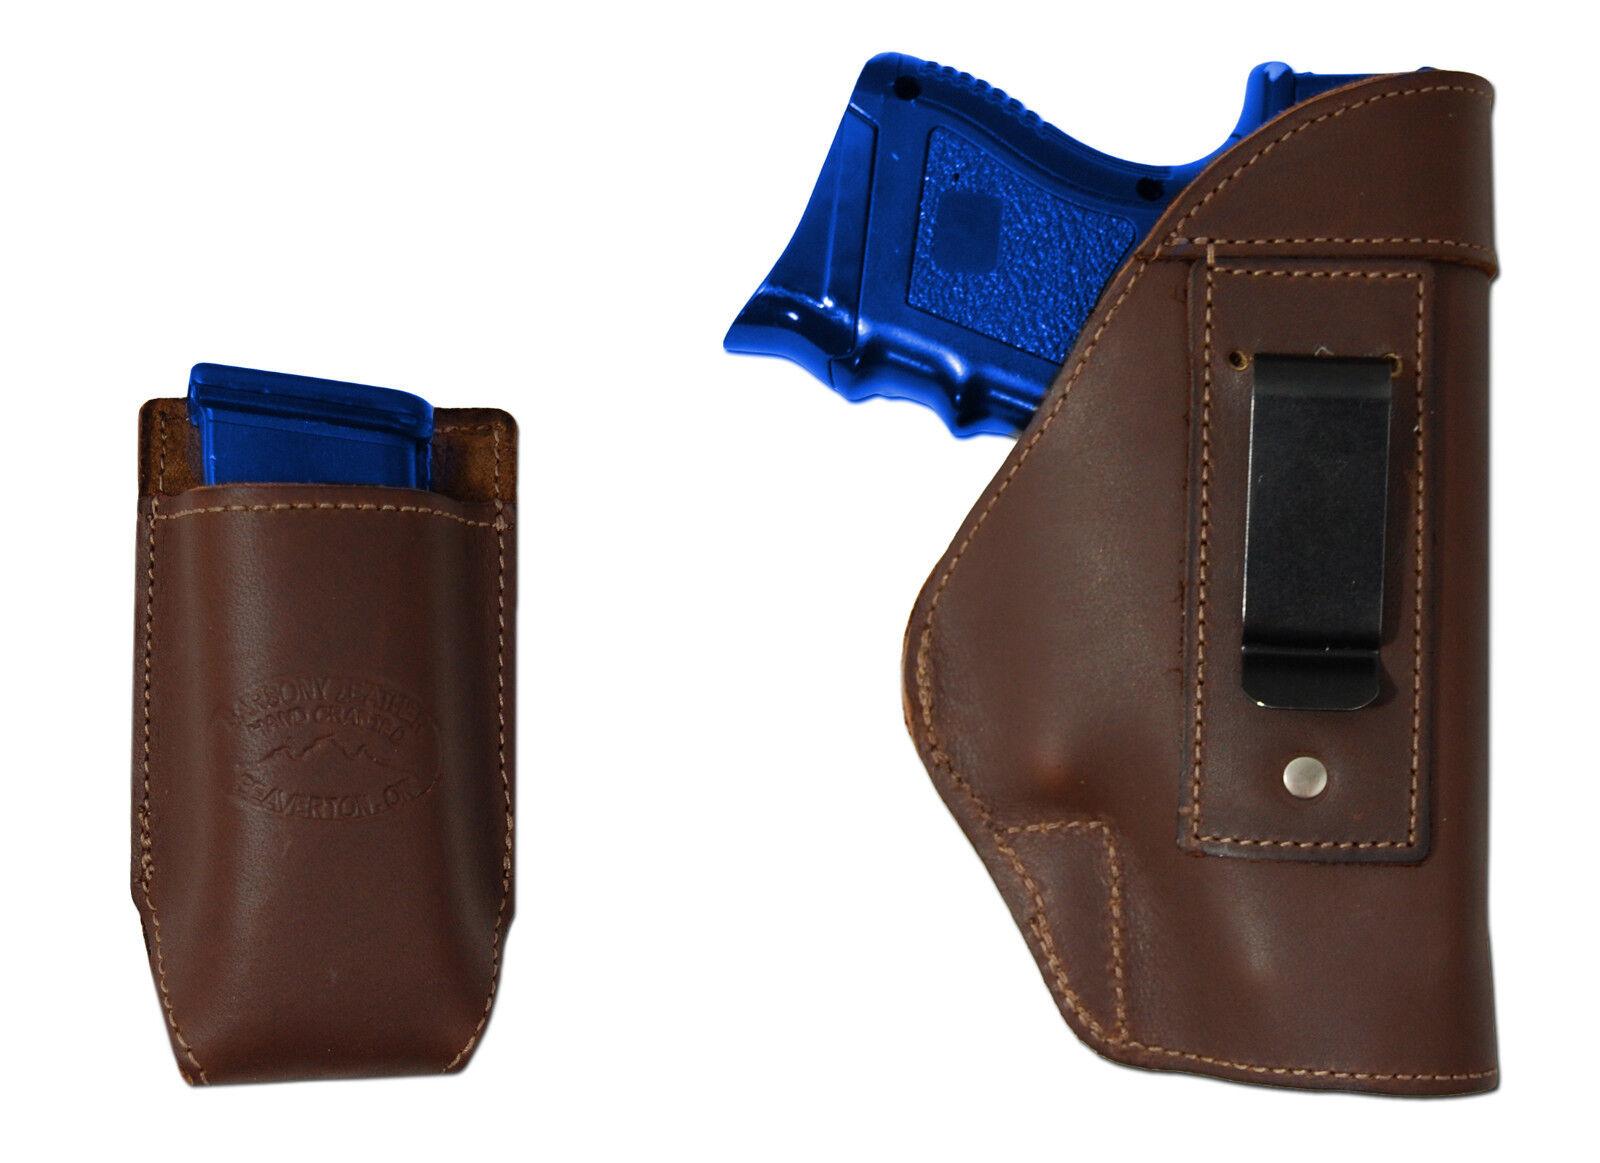 NEW Barsony Braun Leder IWB Gun Holster Bersa + Mag Pouch Bersa Holster Compact 9mm 40 45 1a653a